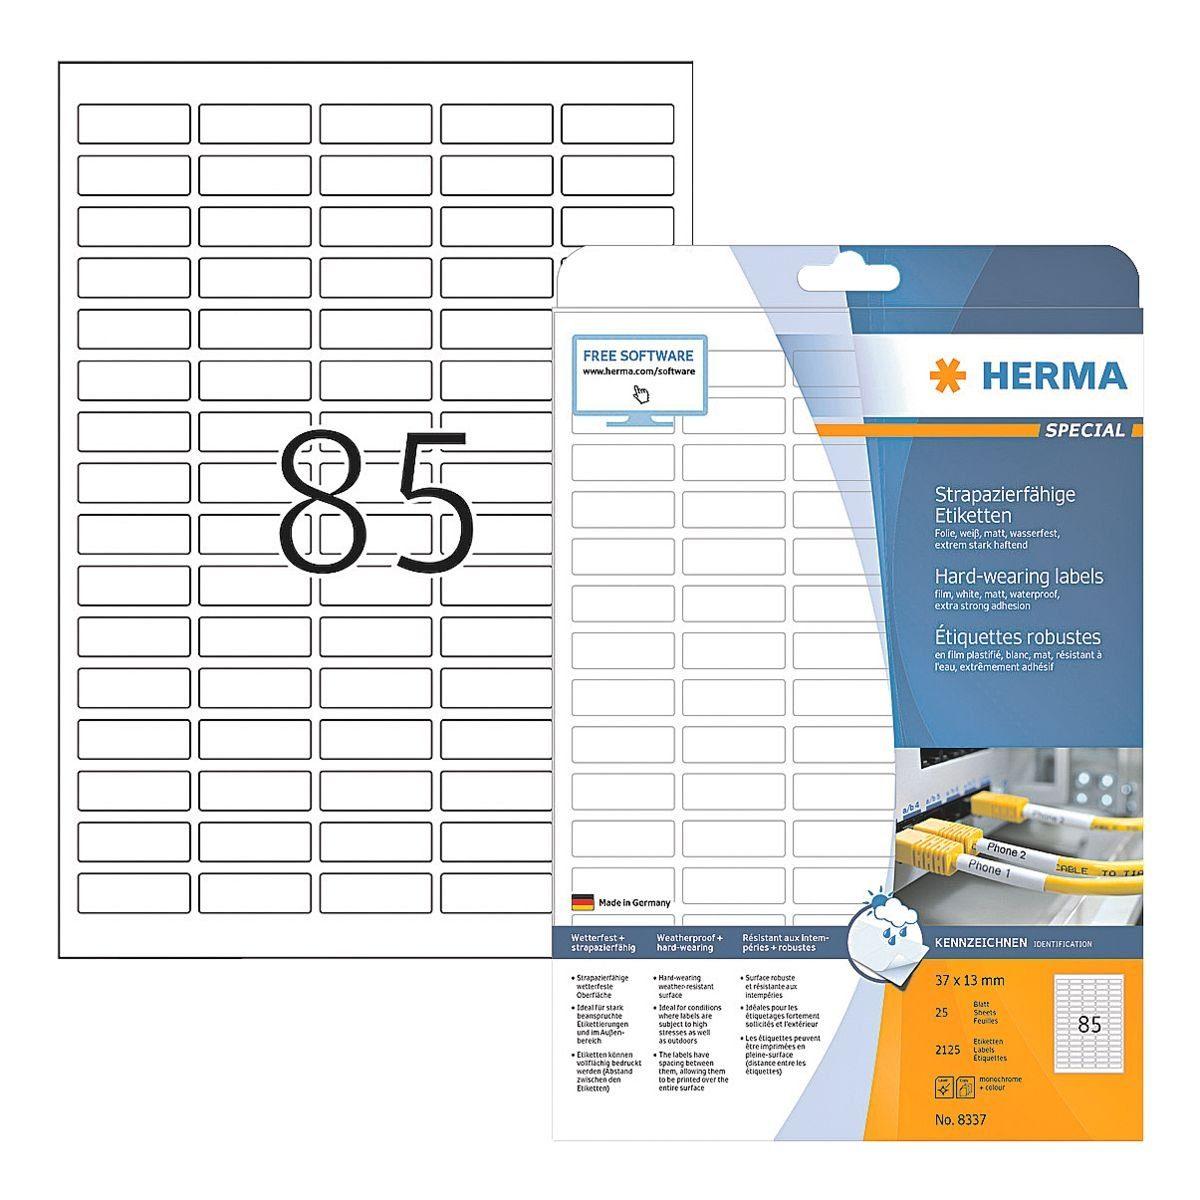 HERMA Outdoor Folien-Etiketten 2125 Stück »Special«